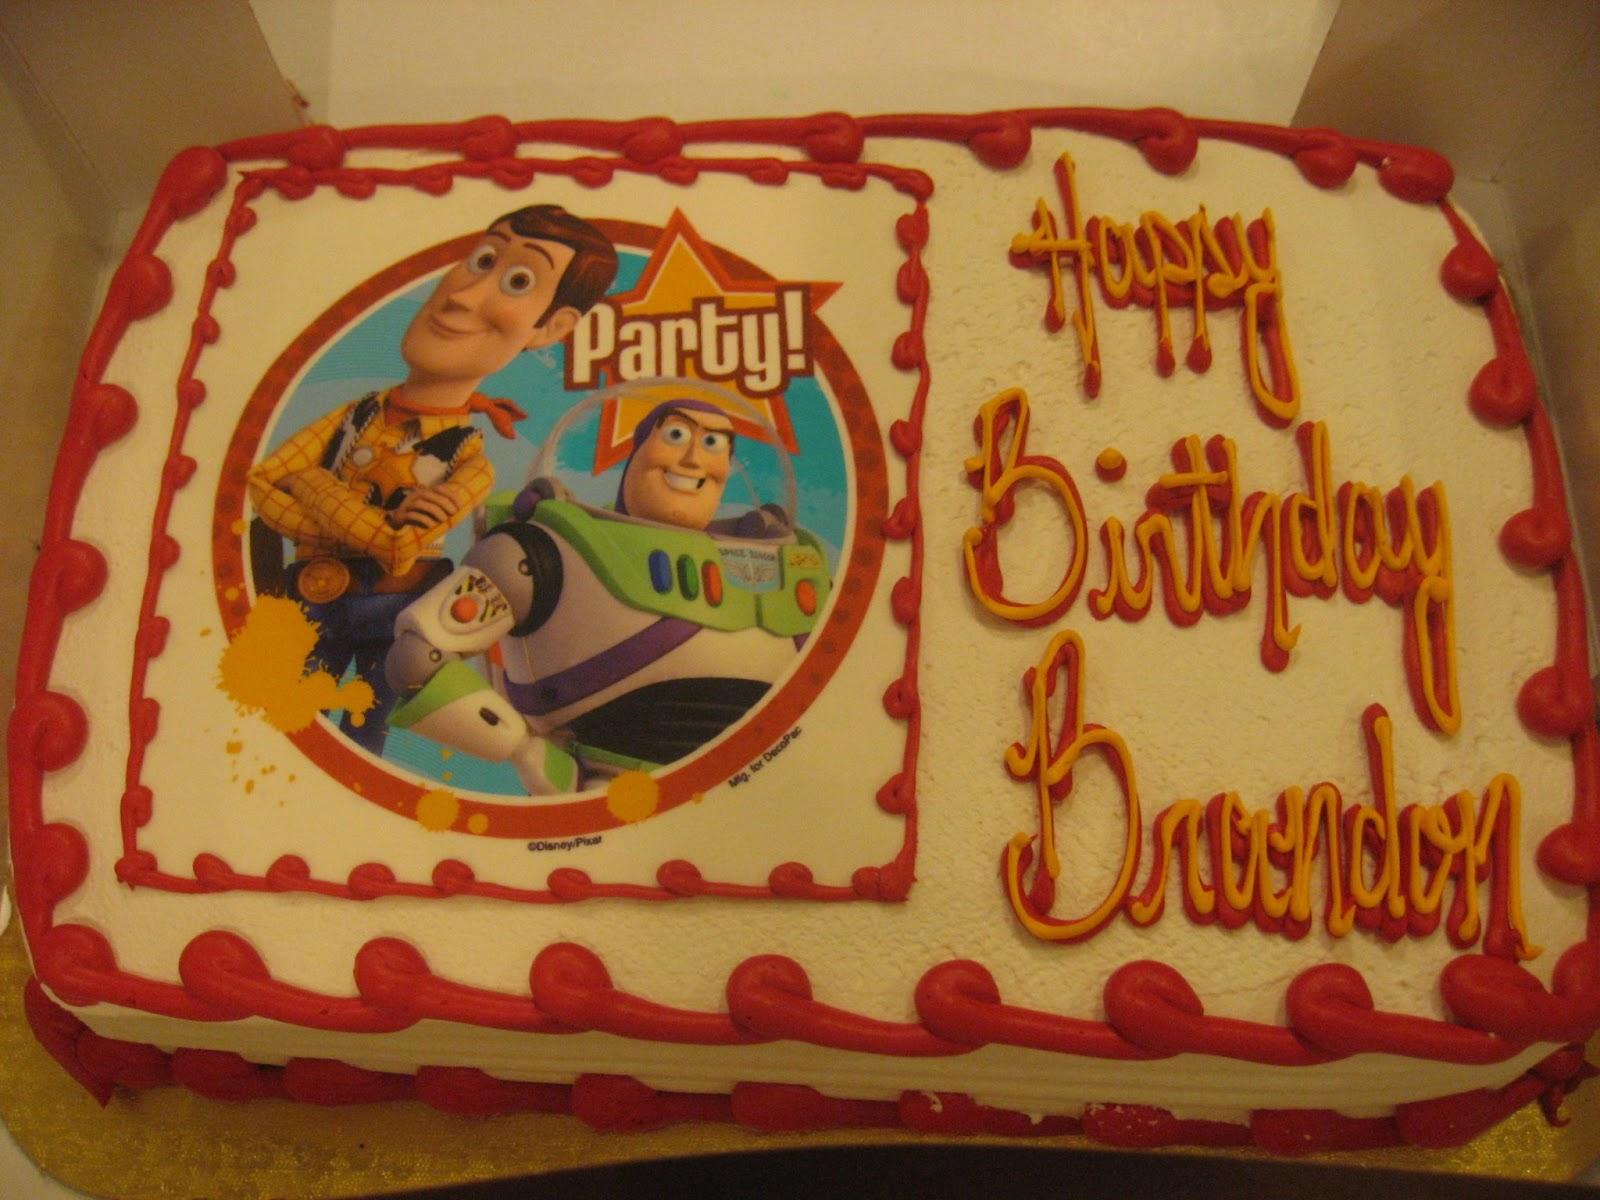 The Newman Family Happy 5th Birthday Brandon